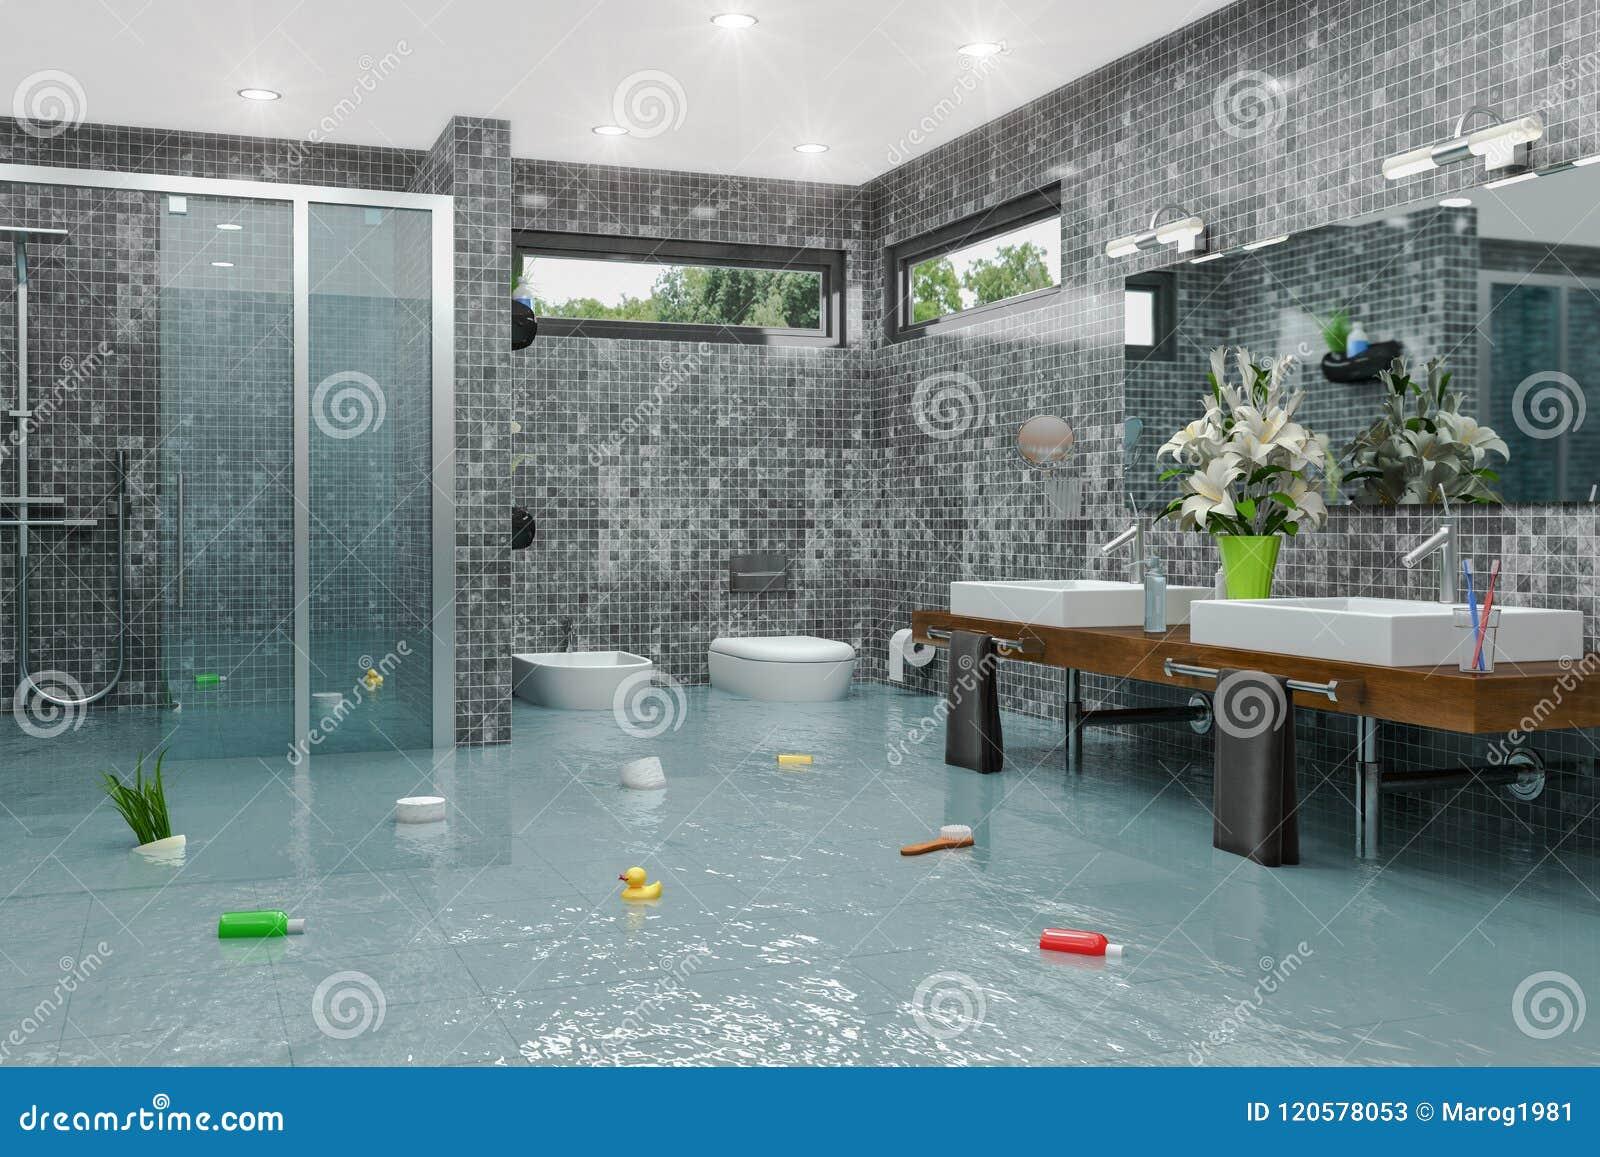 Toilet Flood Images, Stock Photos & Vectors | Shutterstock